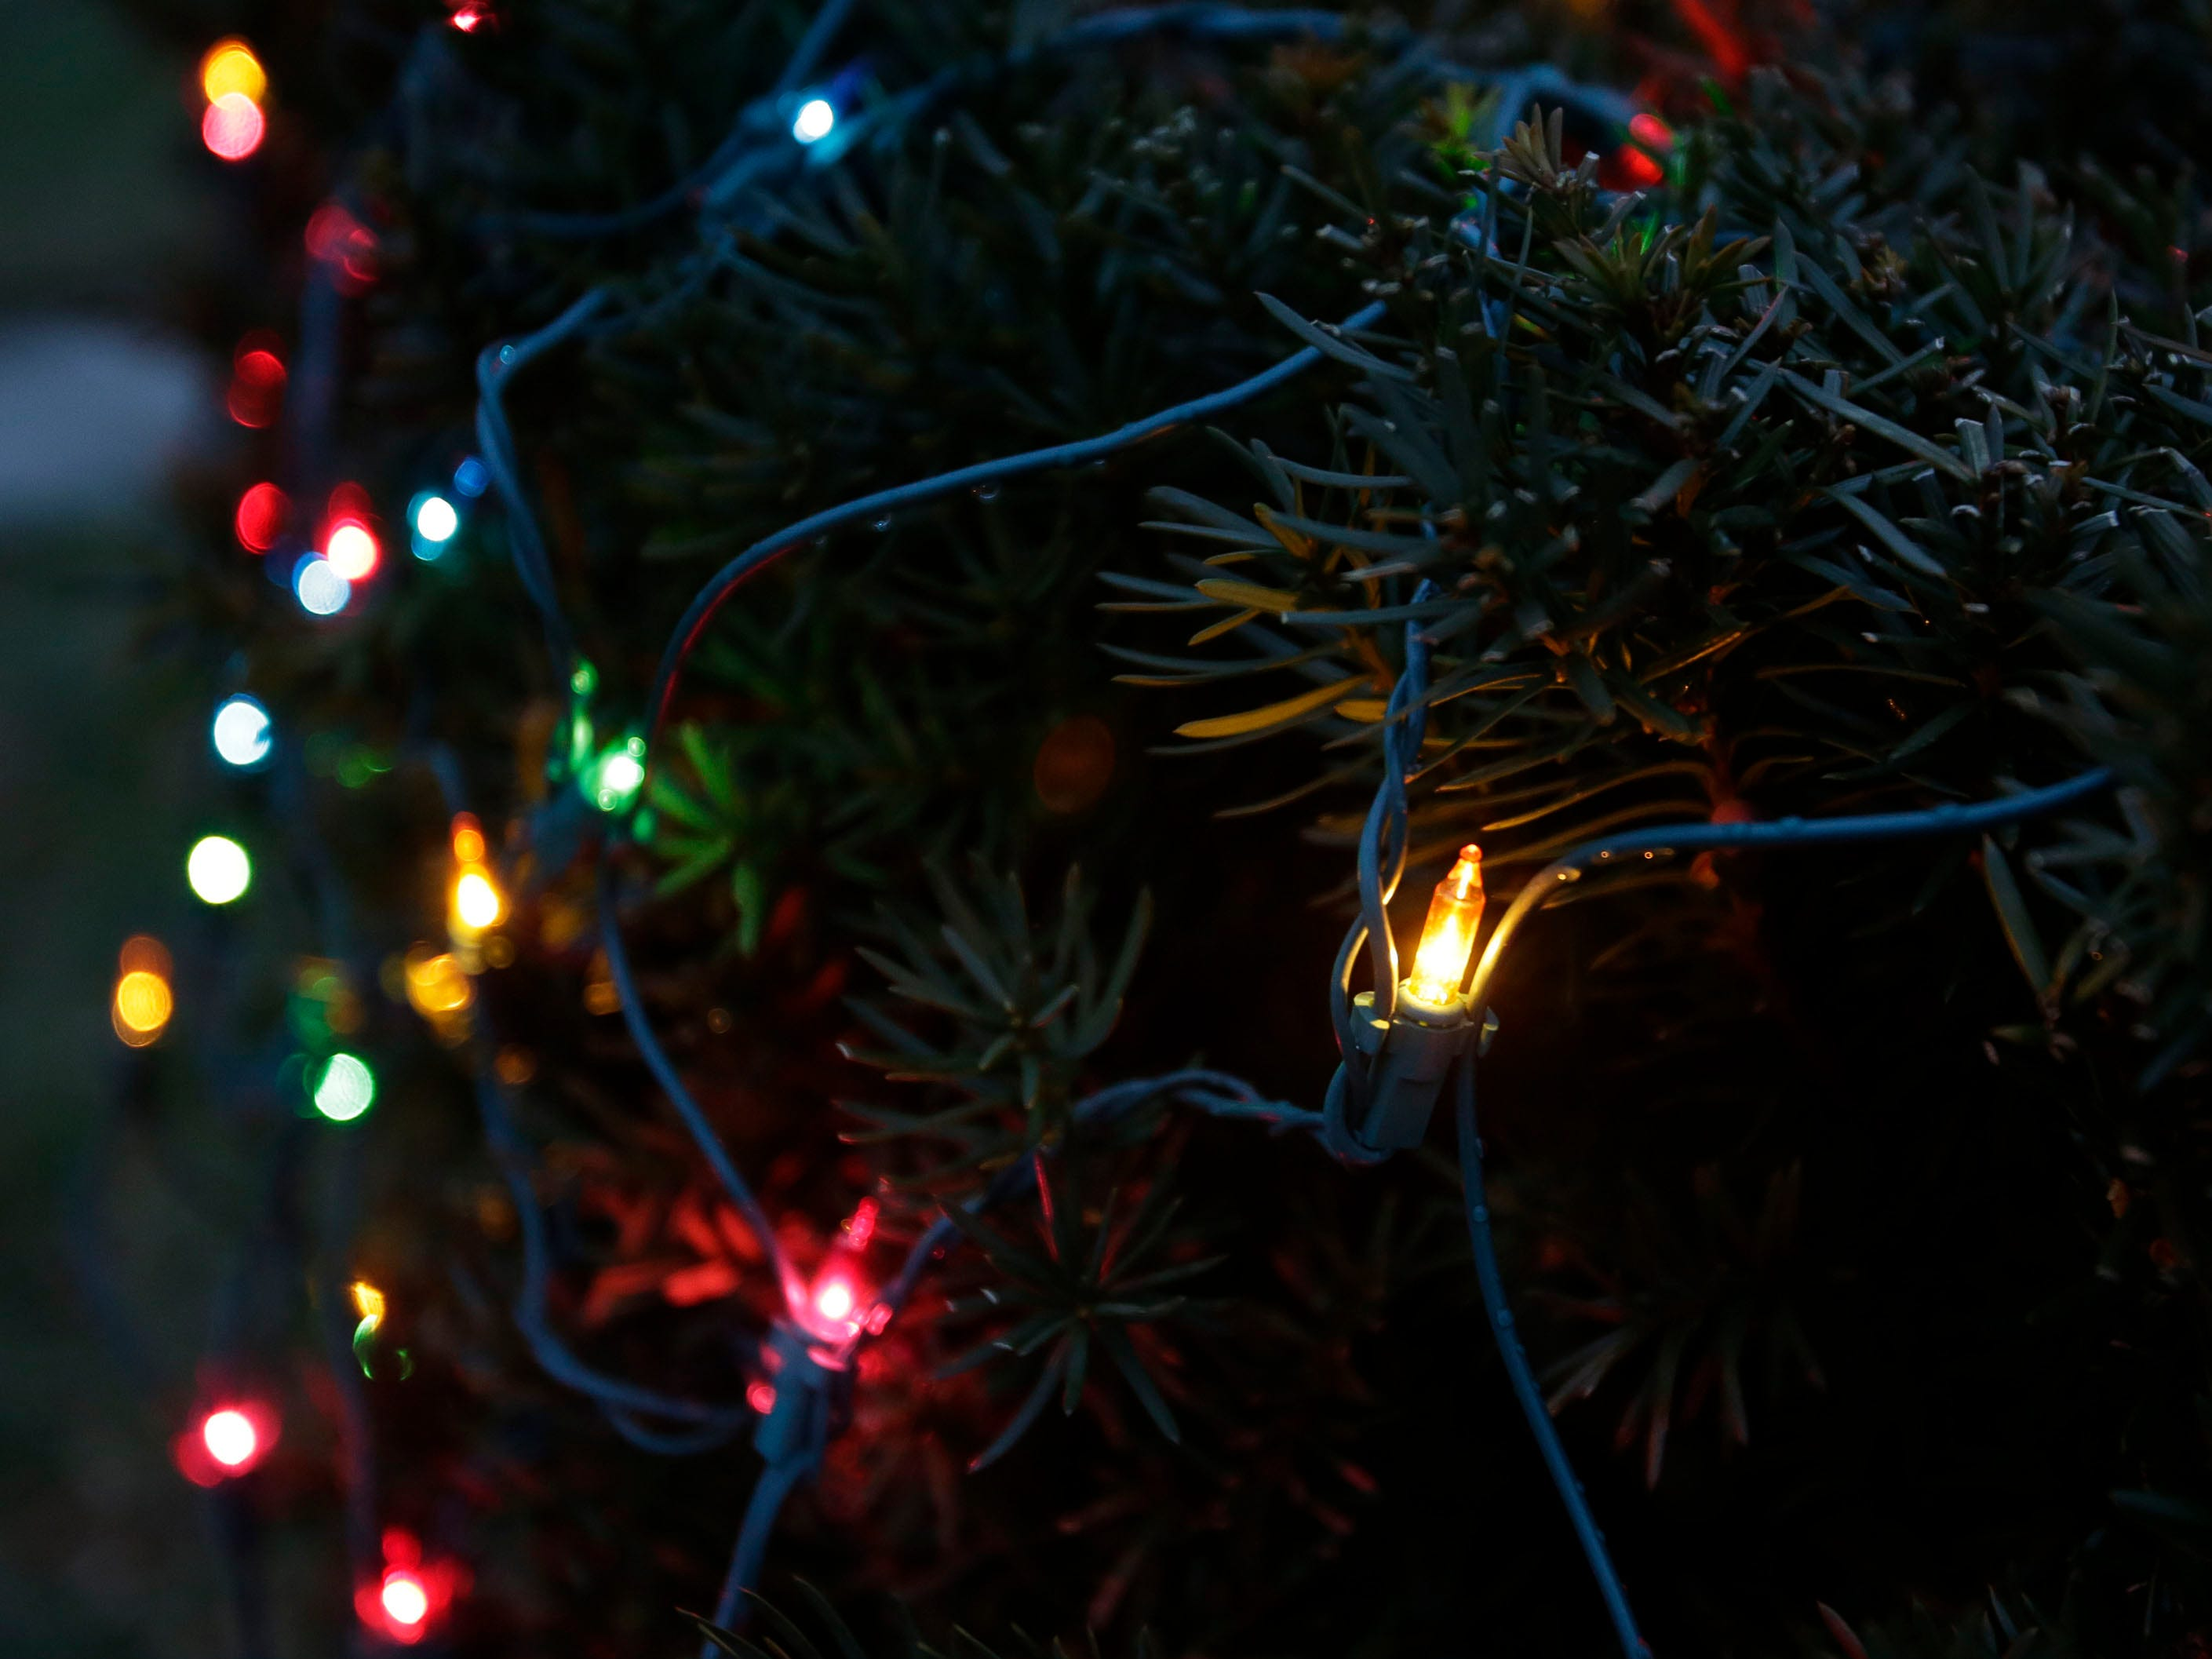 Lights on a bush on North 23rd Street, Wednesday, December 12, 2018, in Sheboygan, Wis.